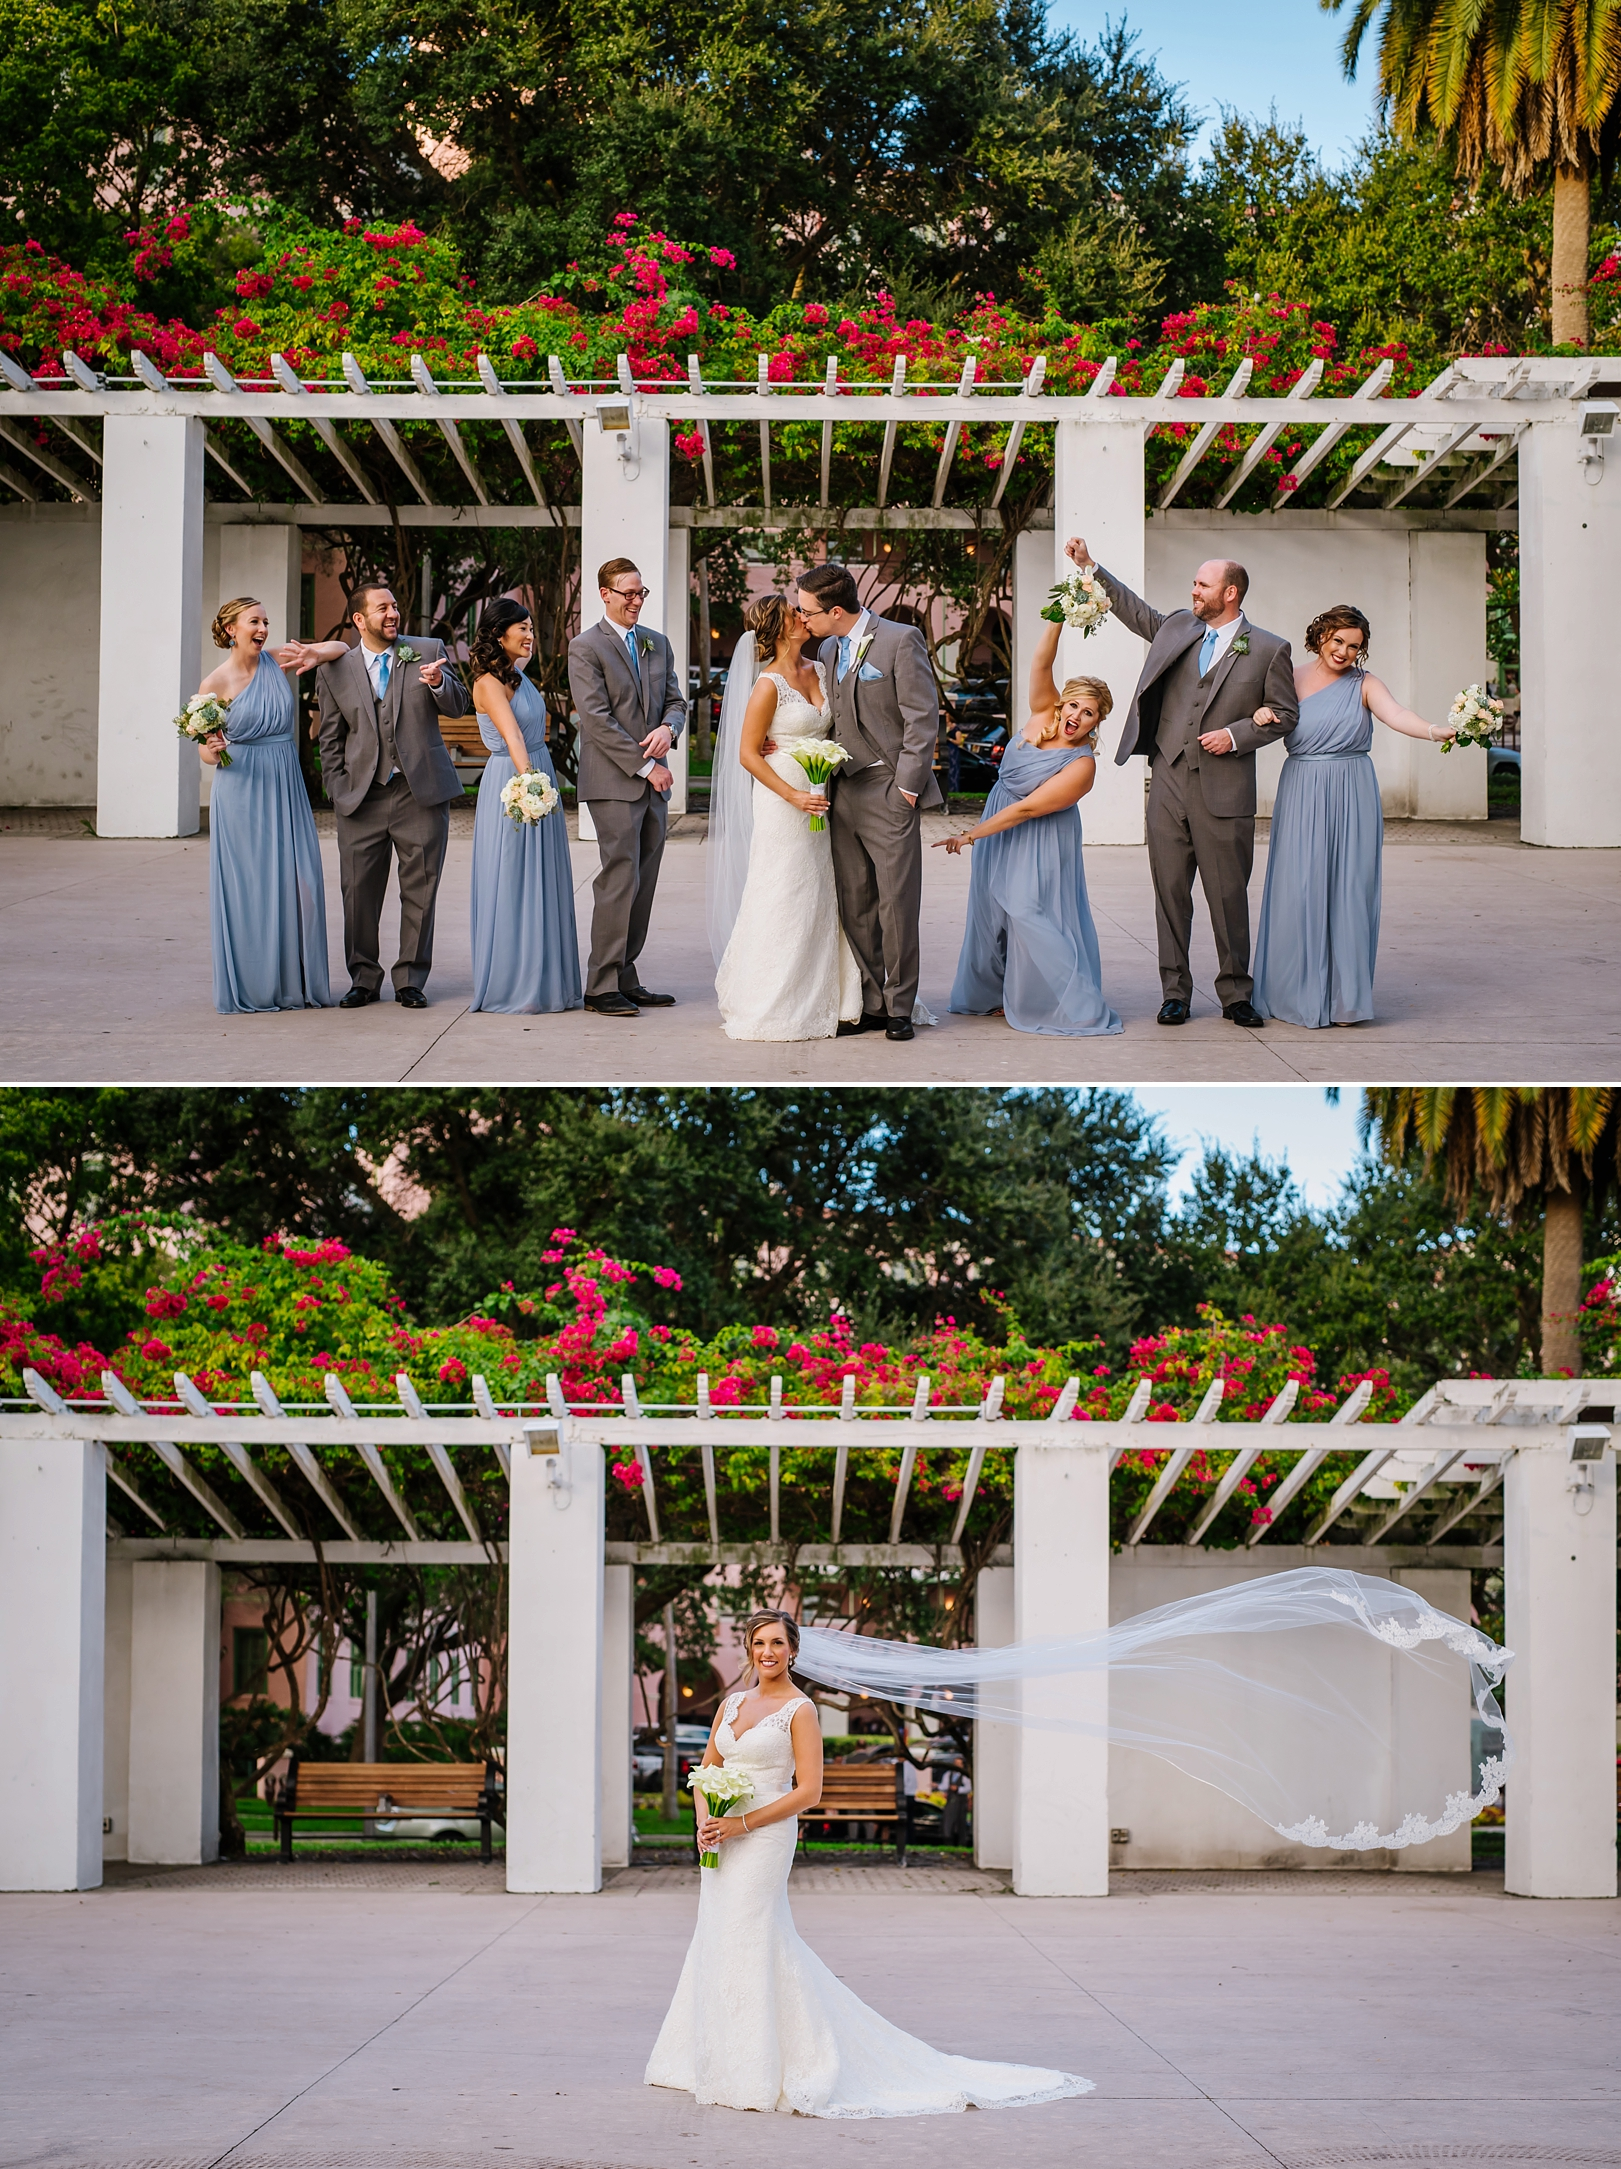 st-pete-art-museum-wedding-vinoy-ashlee-hamon-photography_0011.jpg